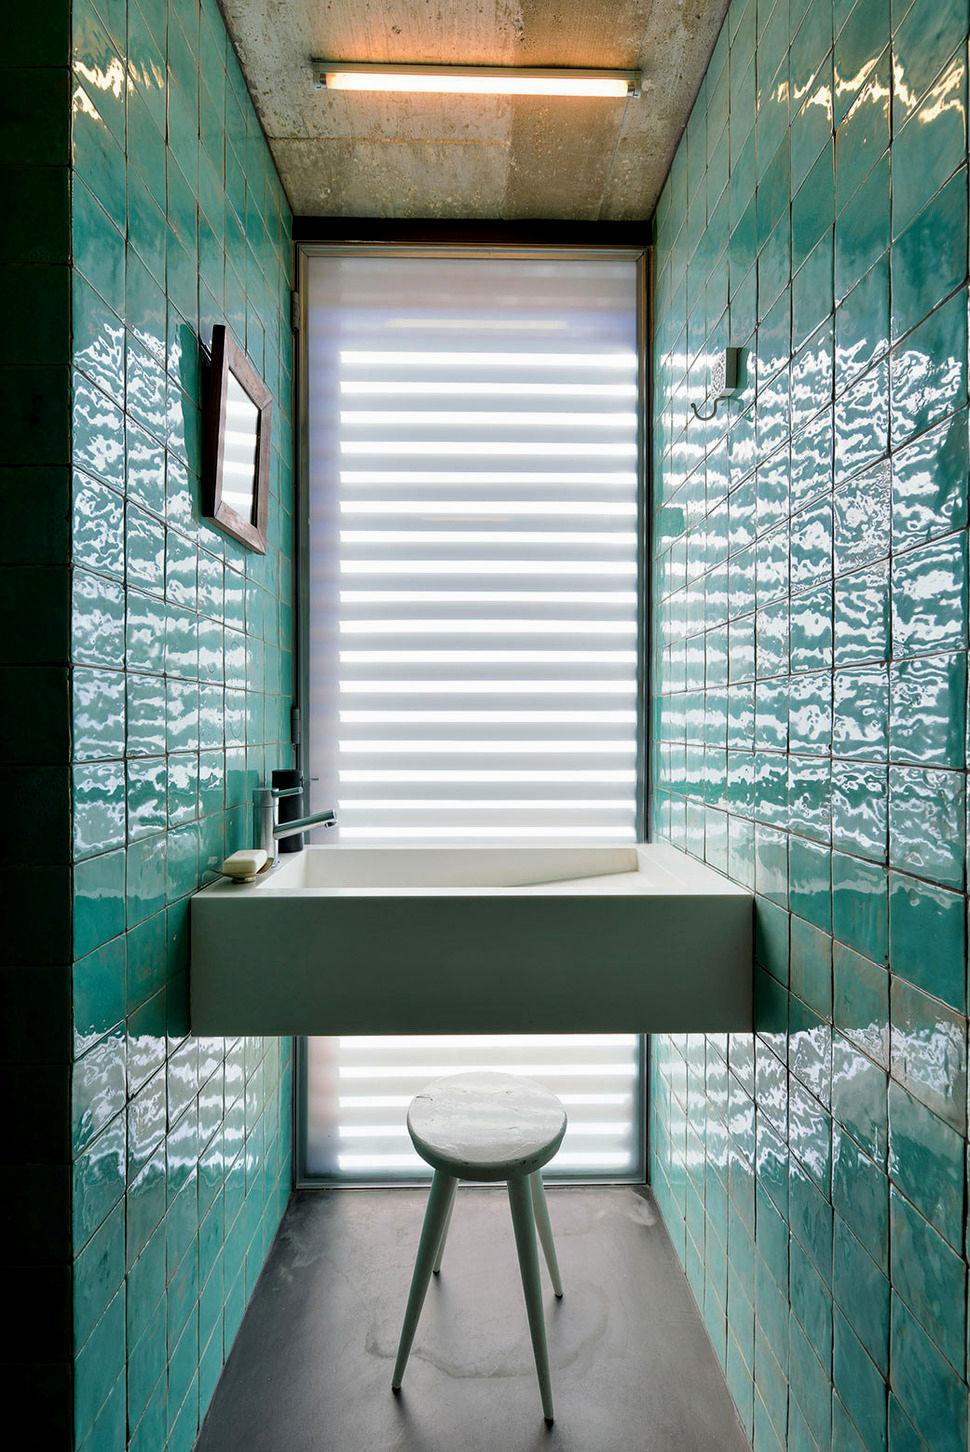 awesome bathroom art ideas layout-Beautiful Bathroom Art Ideas Concept